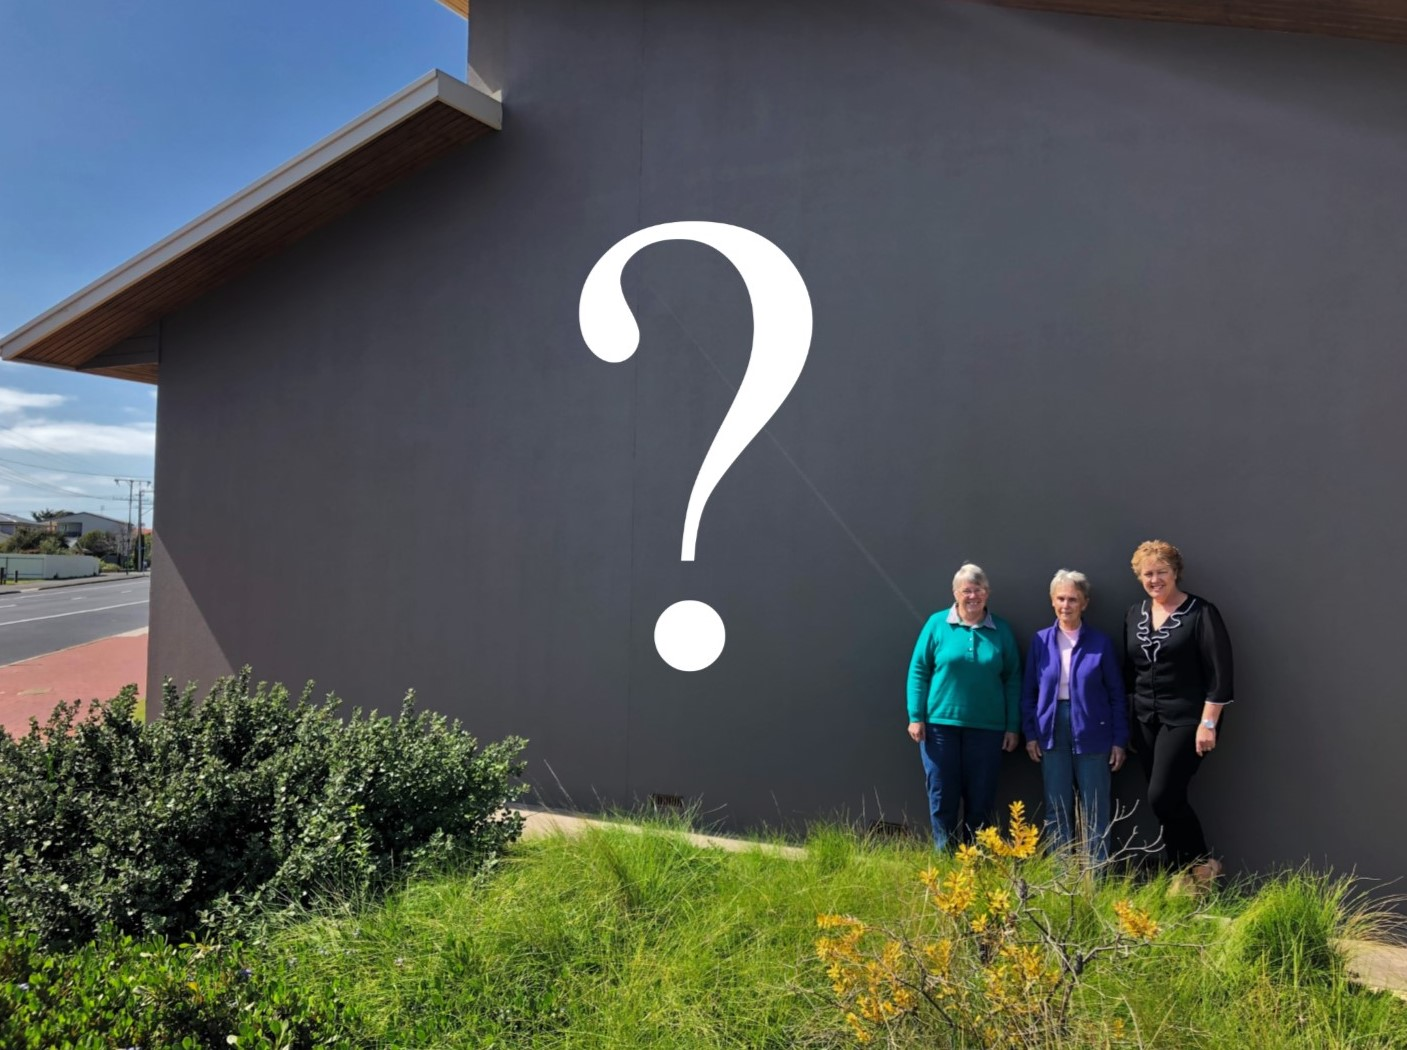 Lifetime of Frienship Wall